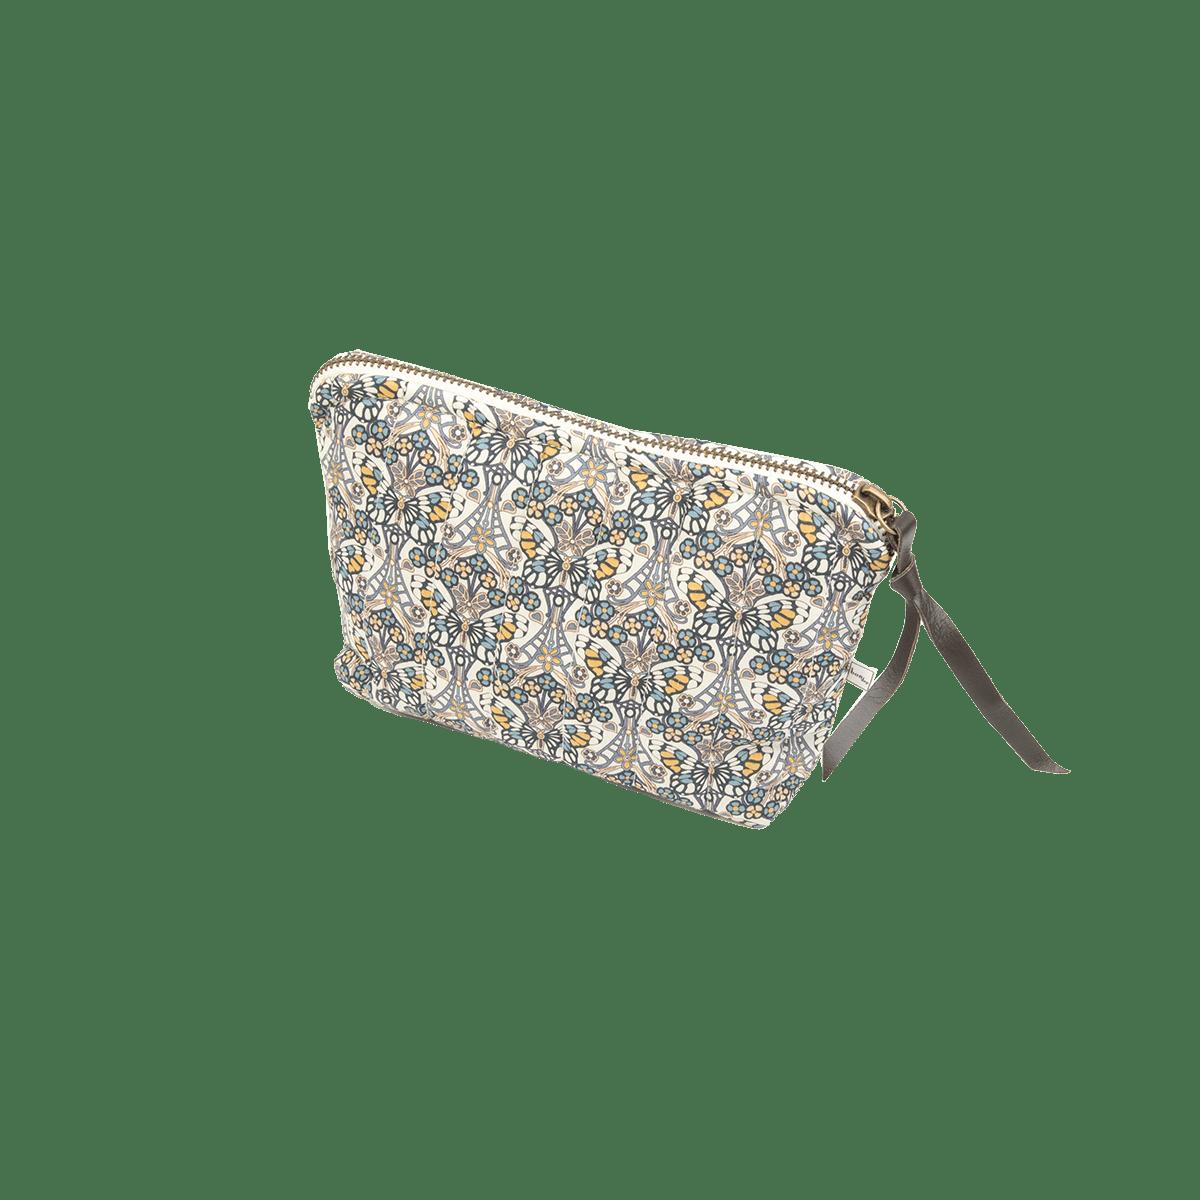 Liberty Pouch XS - Morris butterfly -